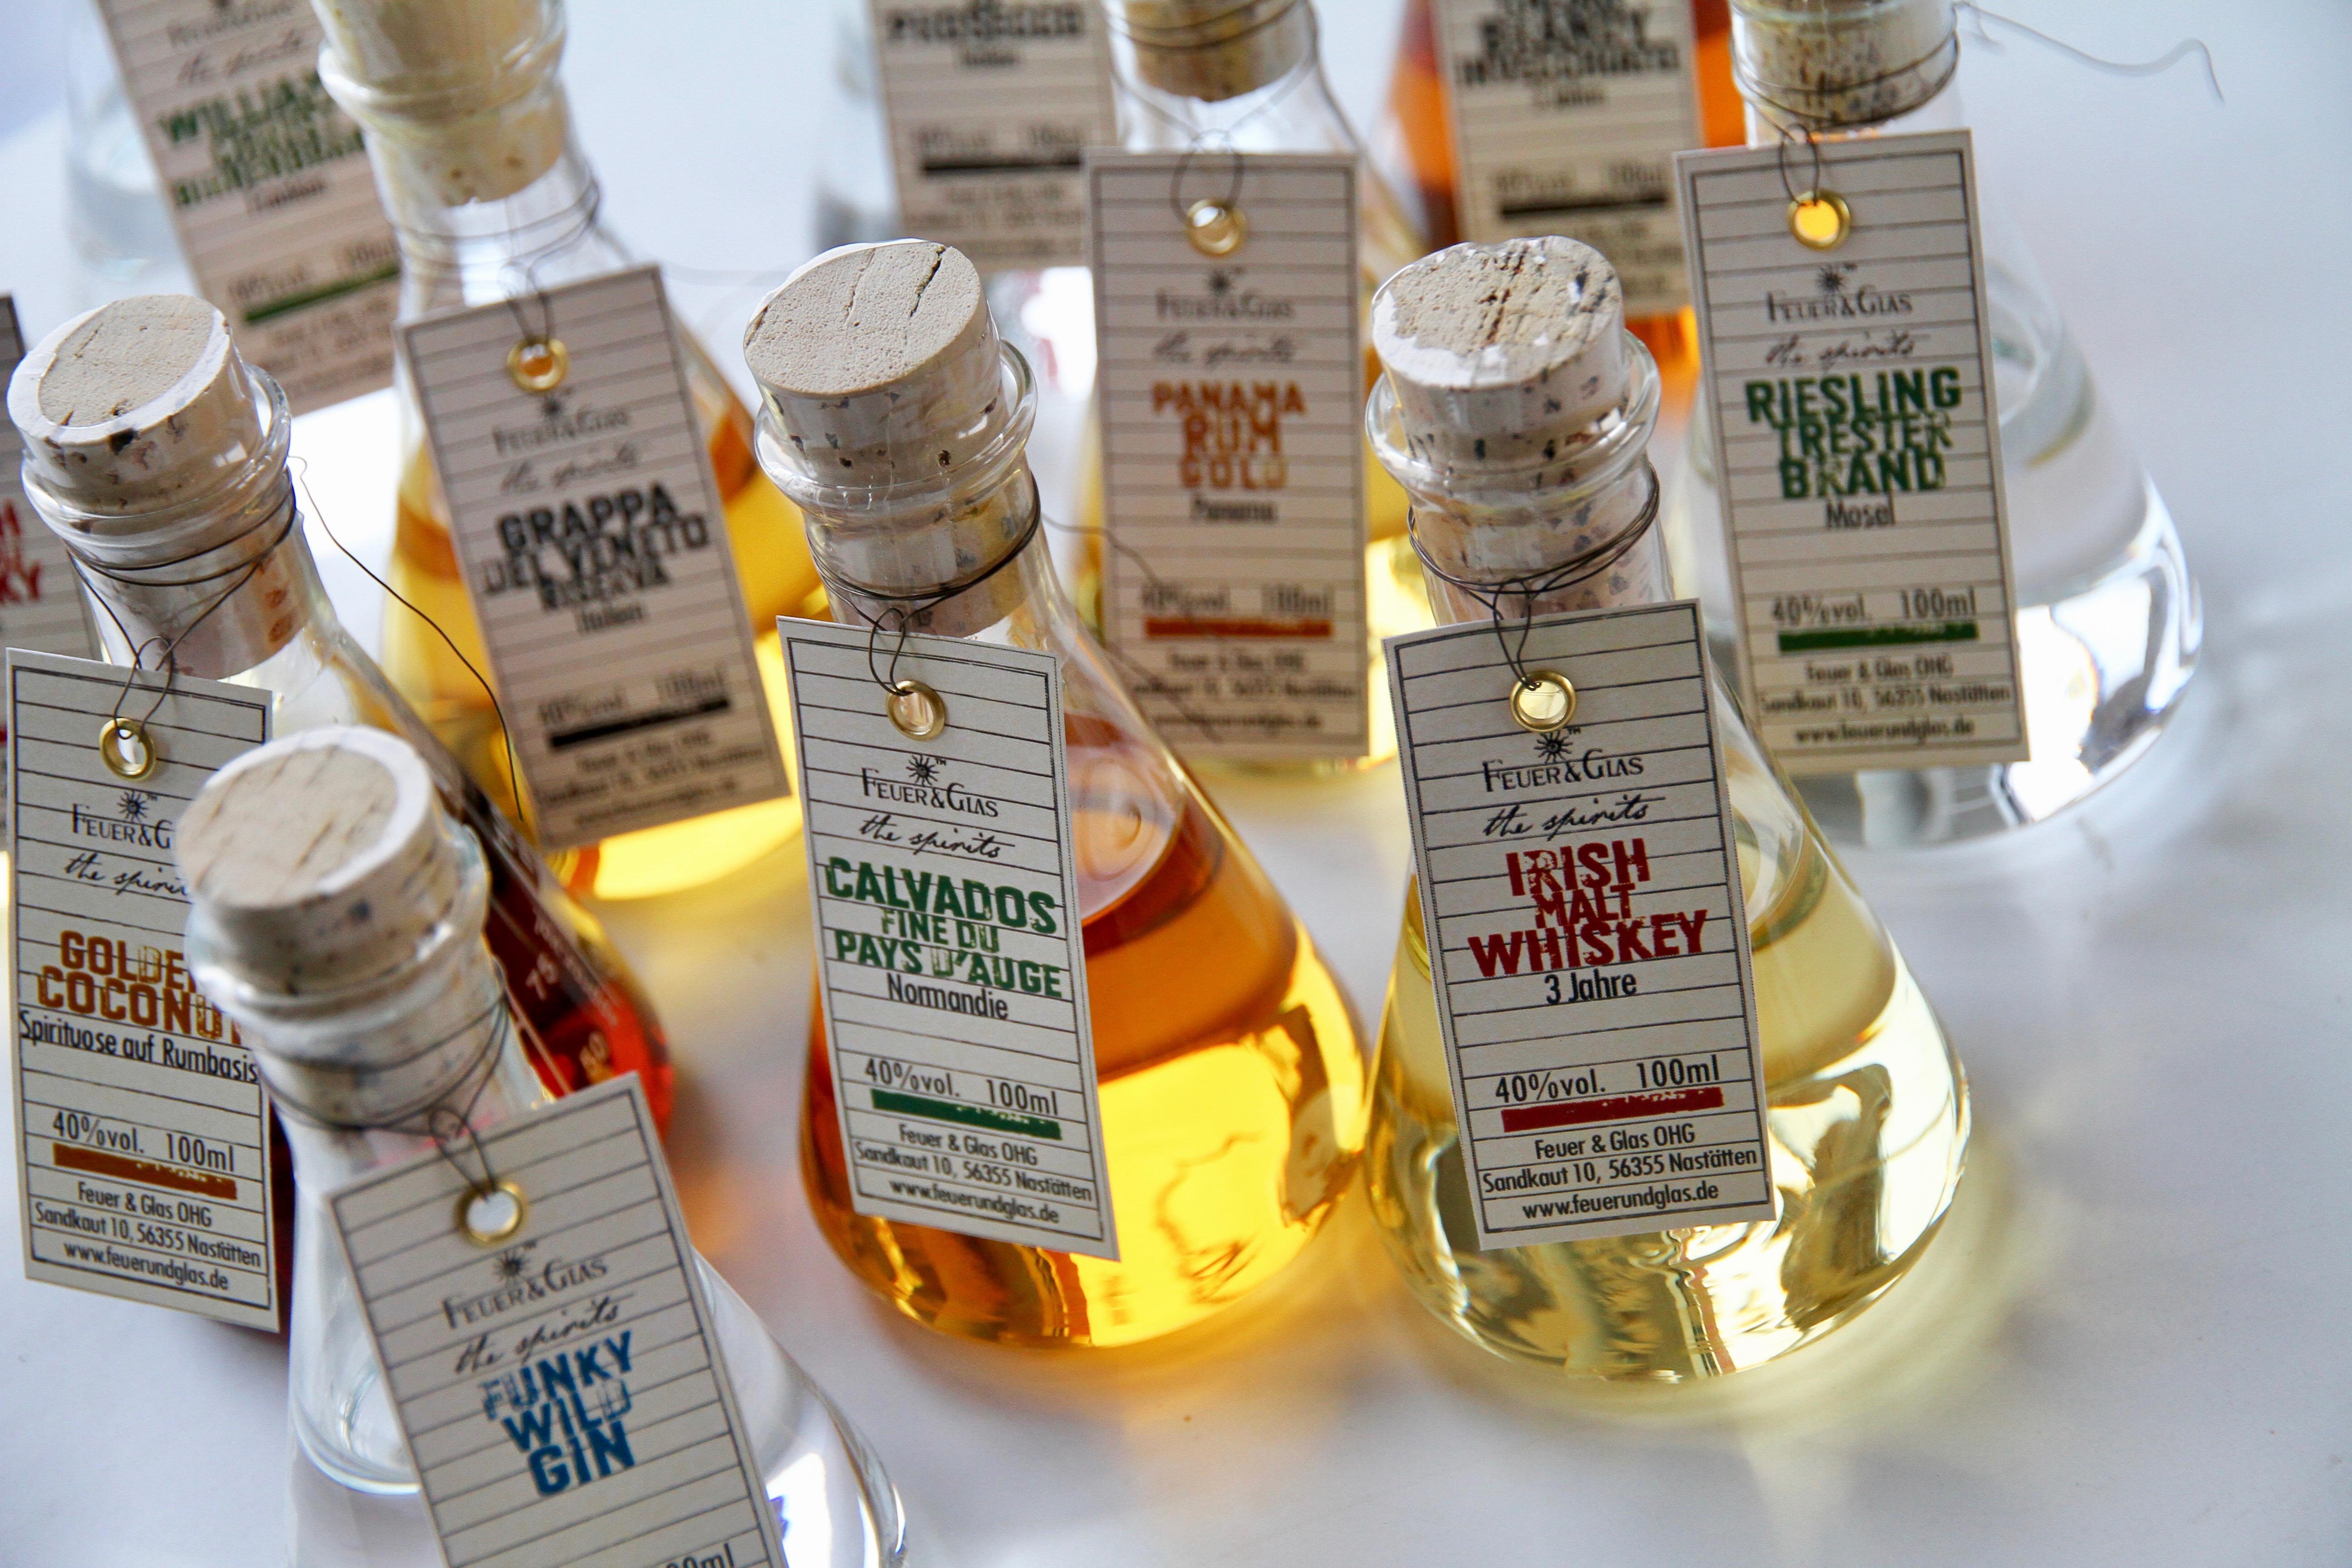 Panama Rum Gold, 100 ml, 40%  VOL